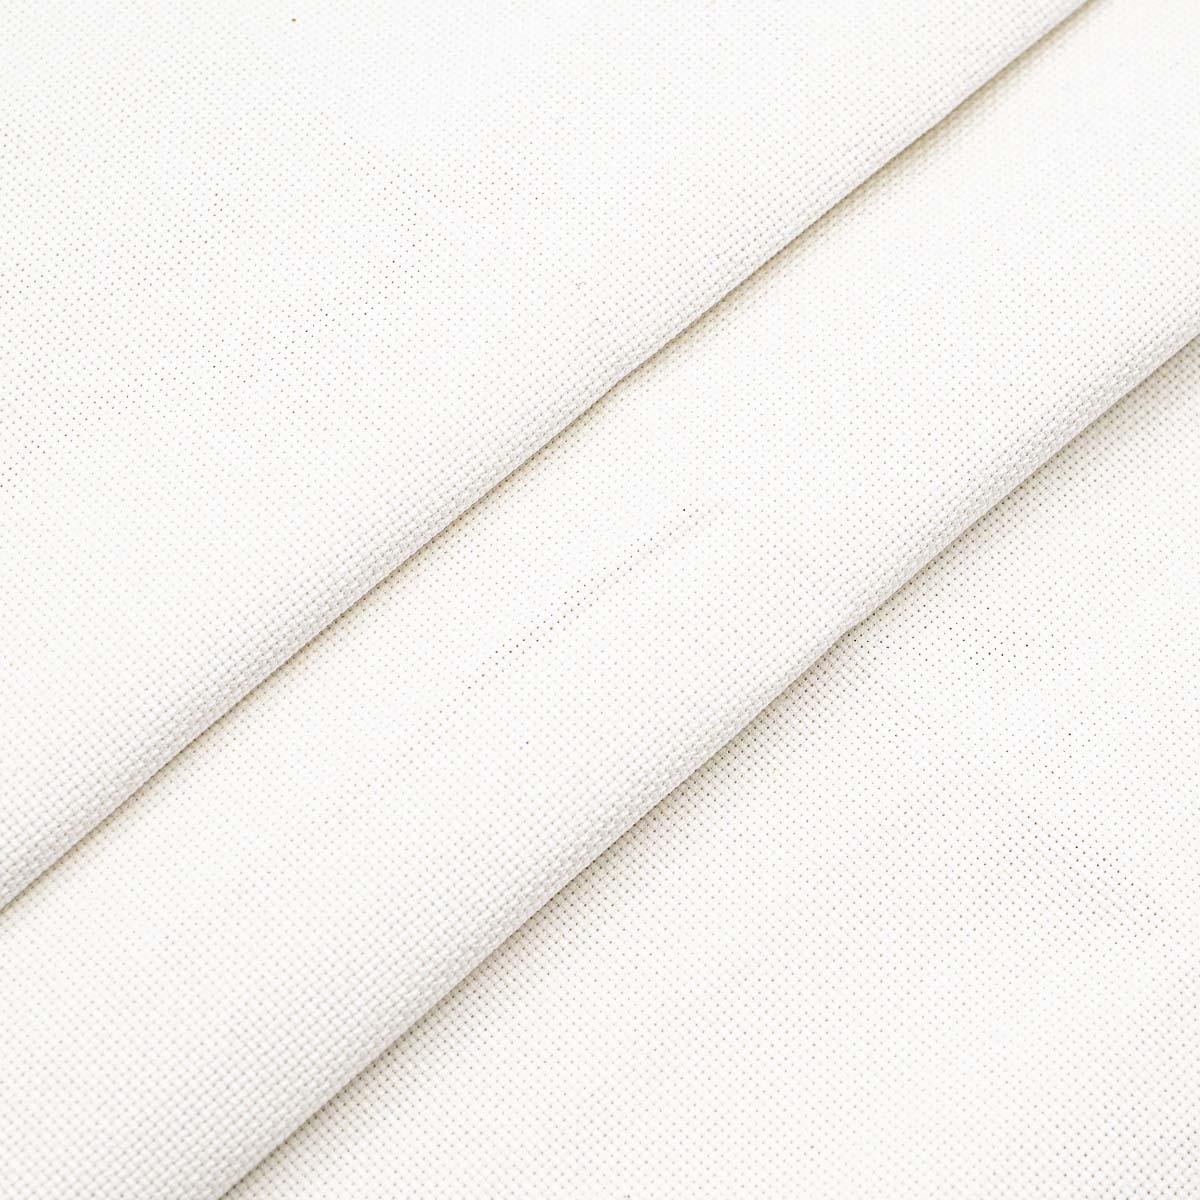 Канва Aida 18ct, 150*100см белая Bestex